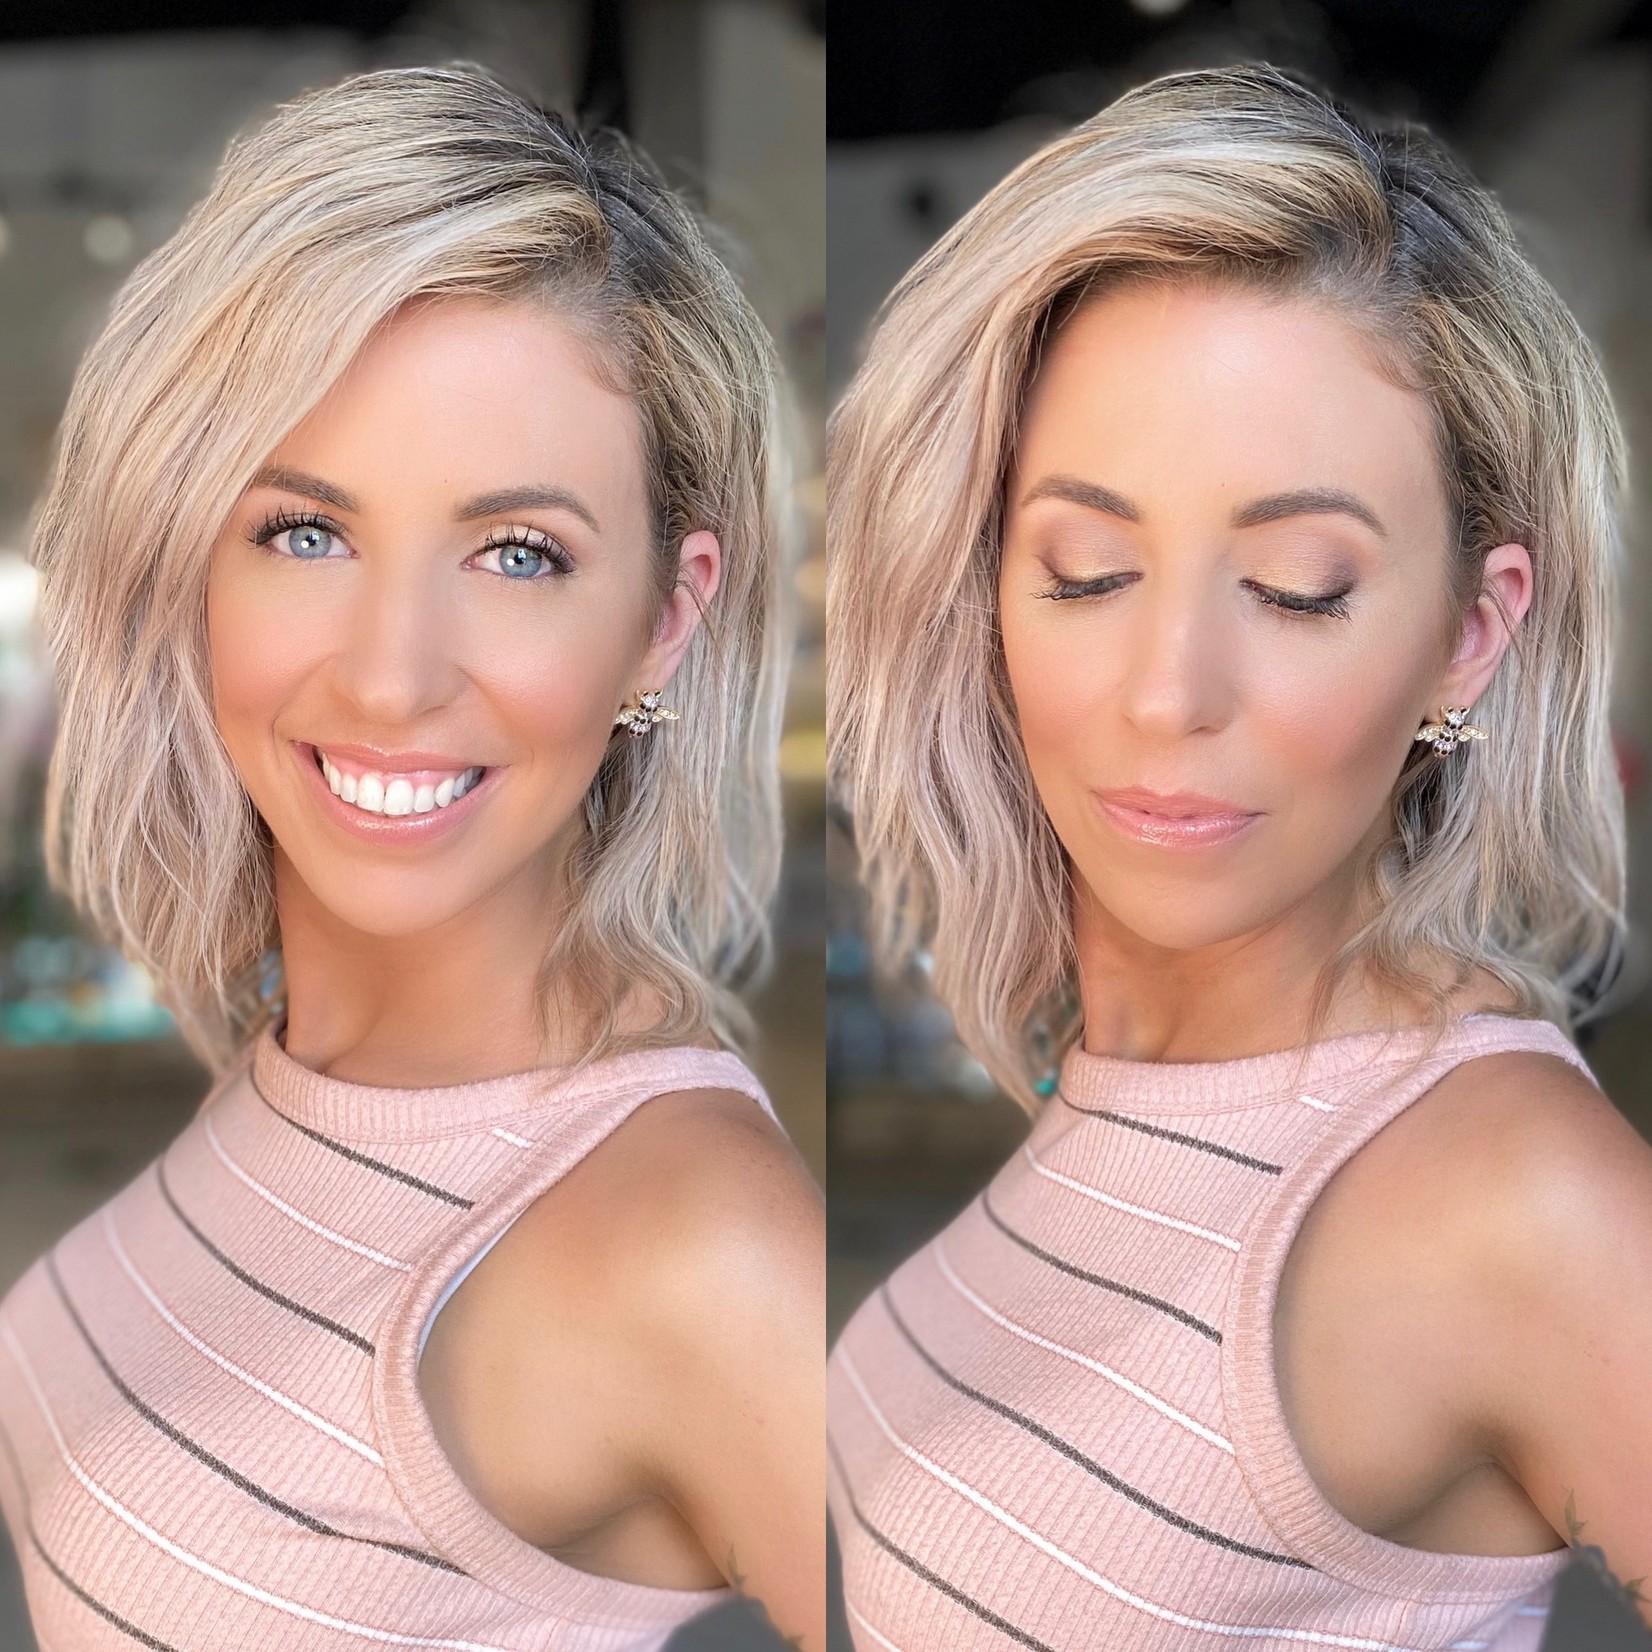 JKC SHOP BY EYE  - Blonde Hair + Blue Eyes